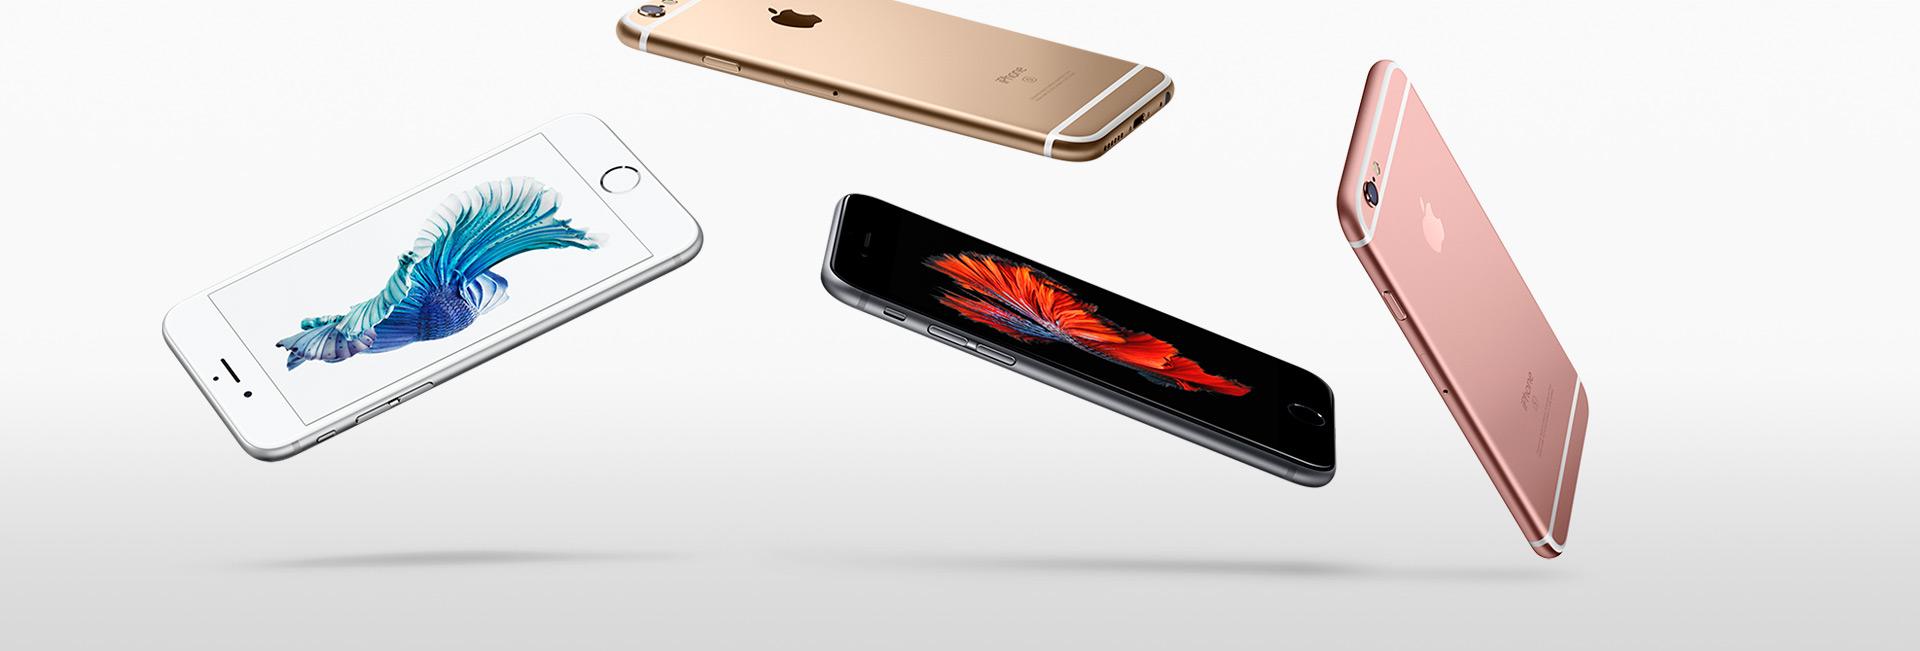 Super-slider-iPhone6s-bg